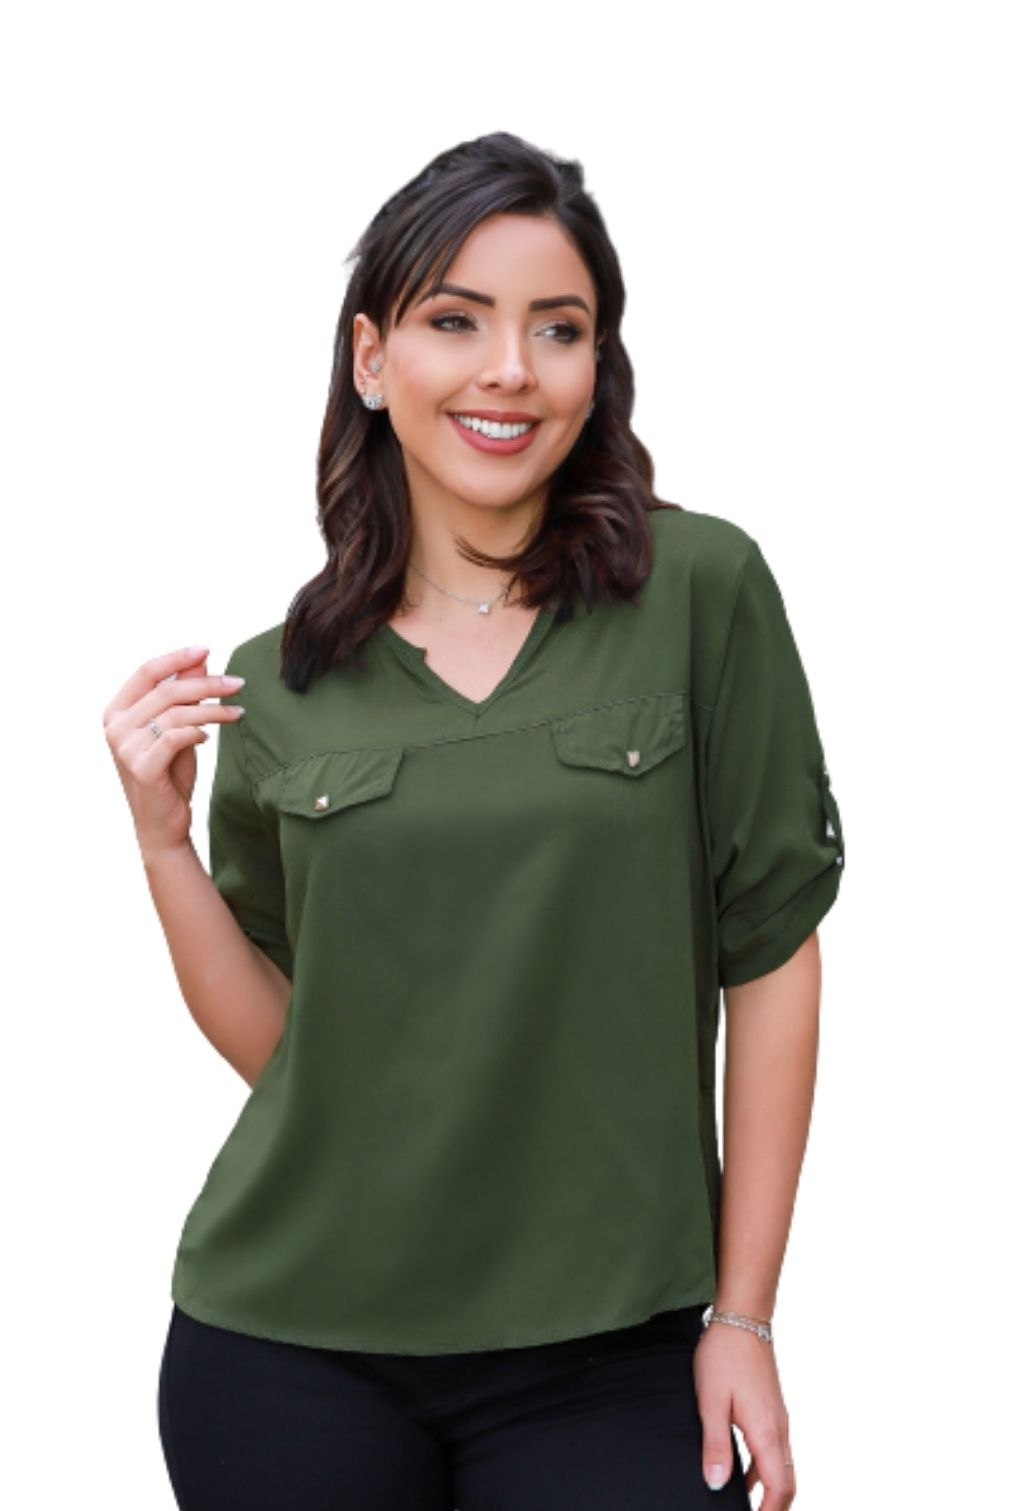 Camisa Blusa Feminina Manga Curta Social Lisa Verde Militar  - ModaStore   Moda Feminina